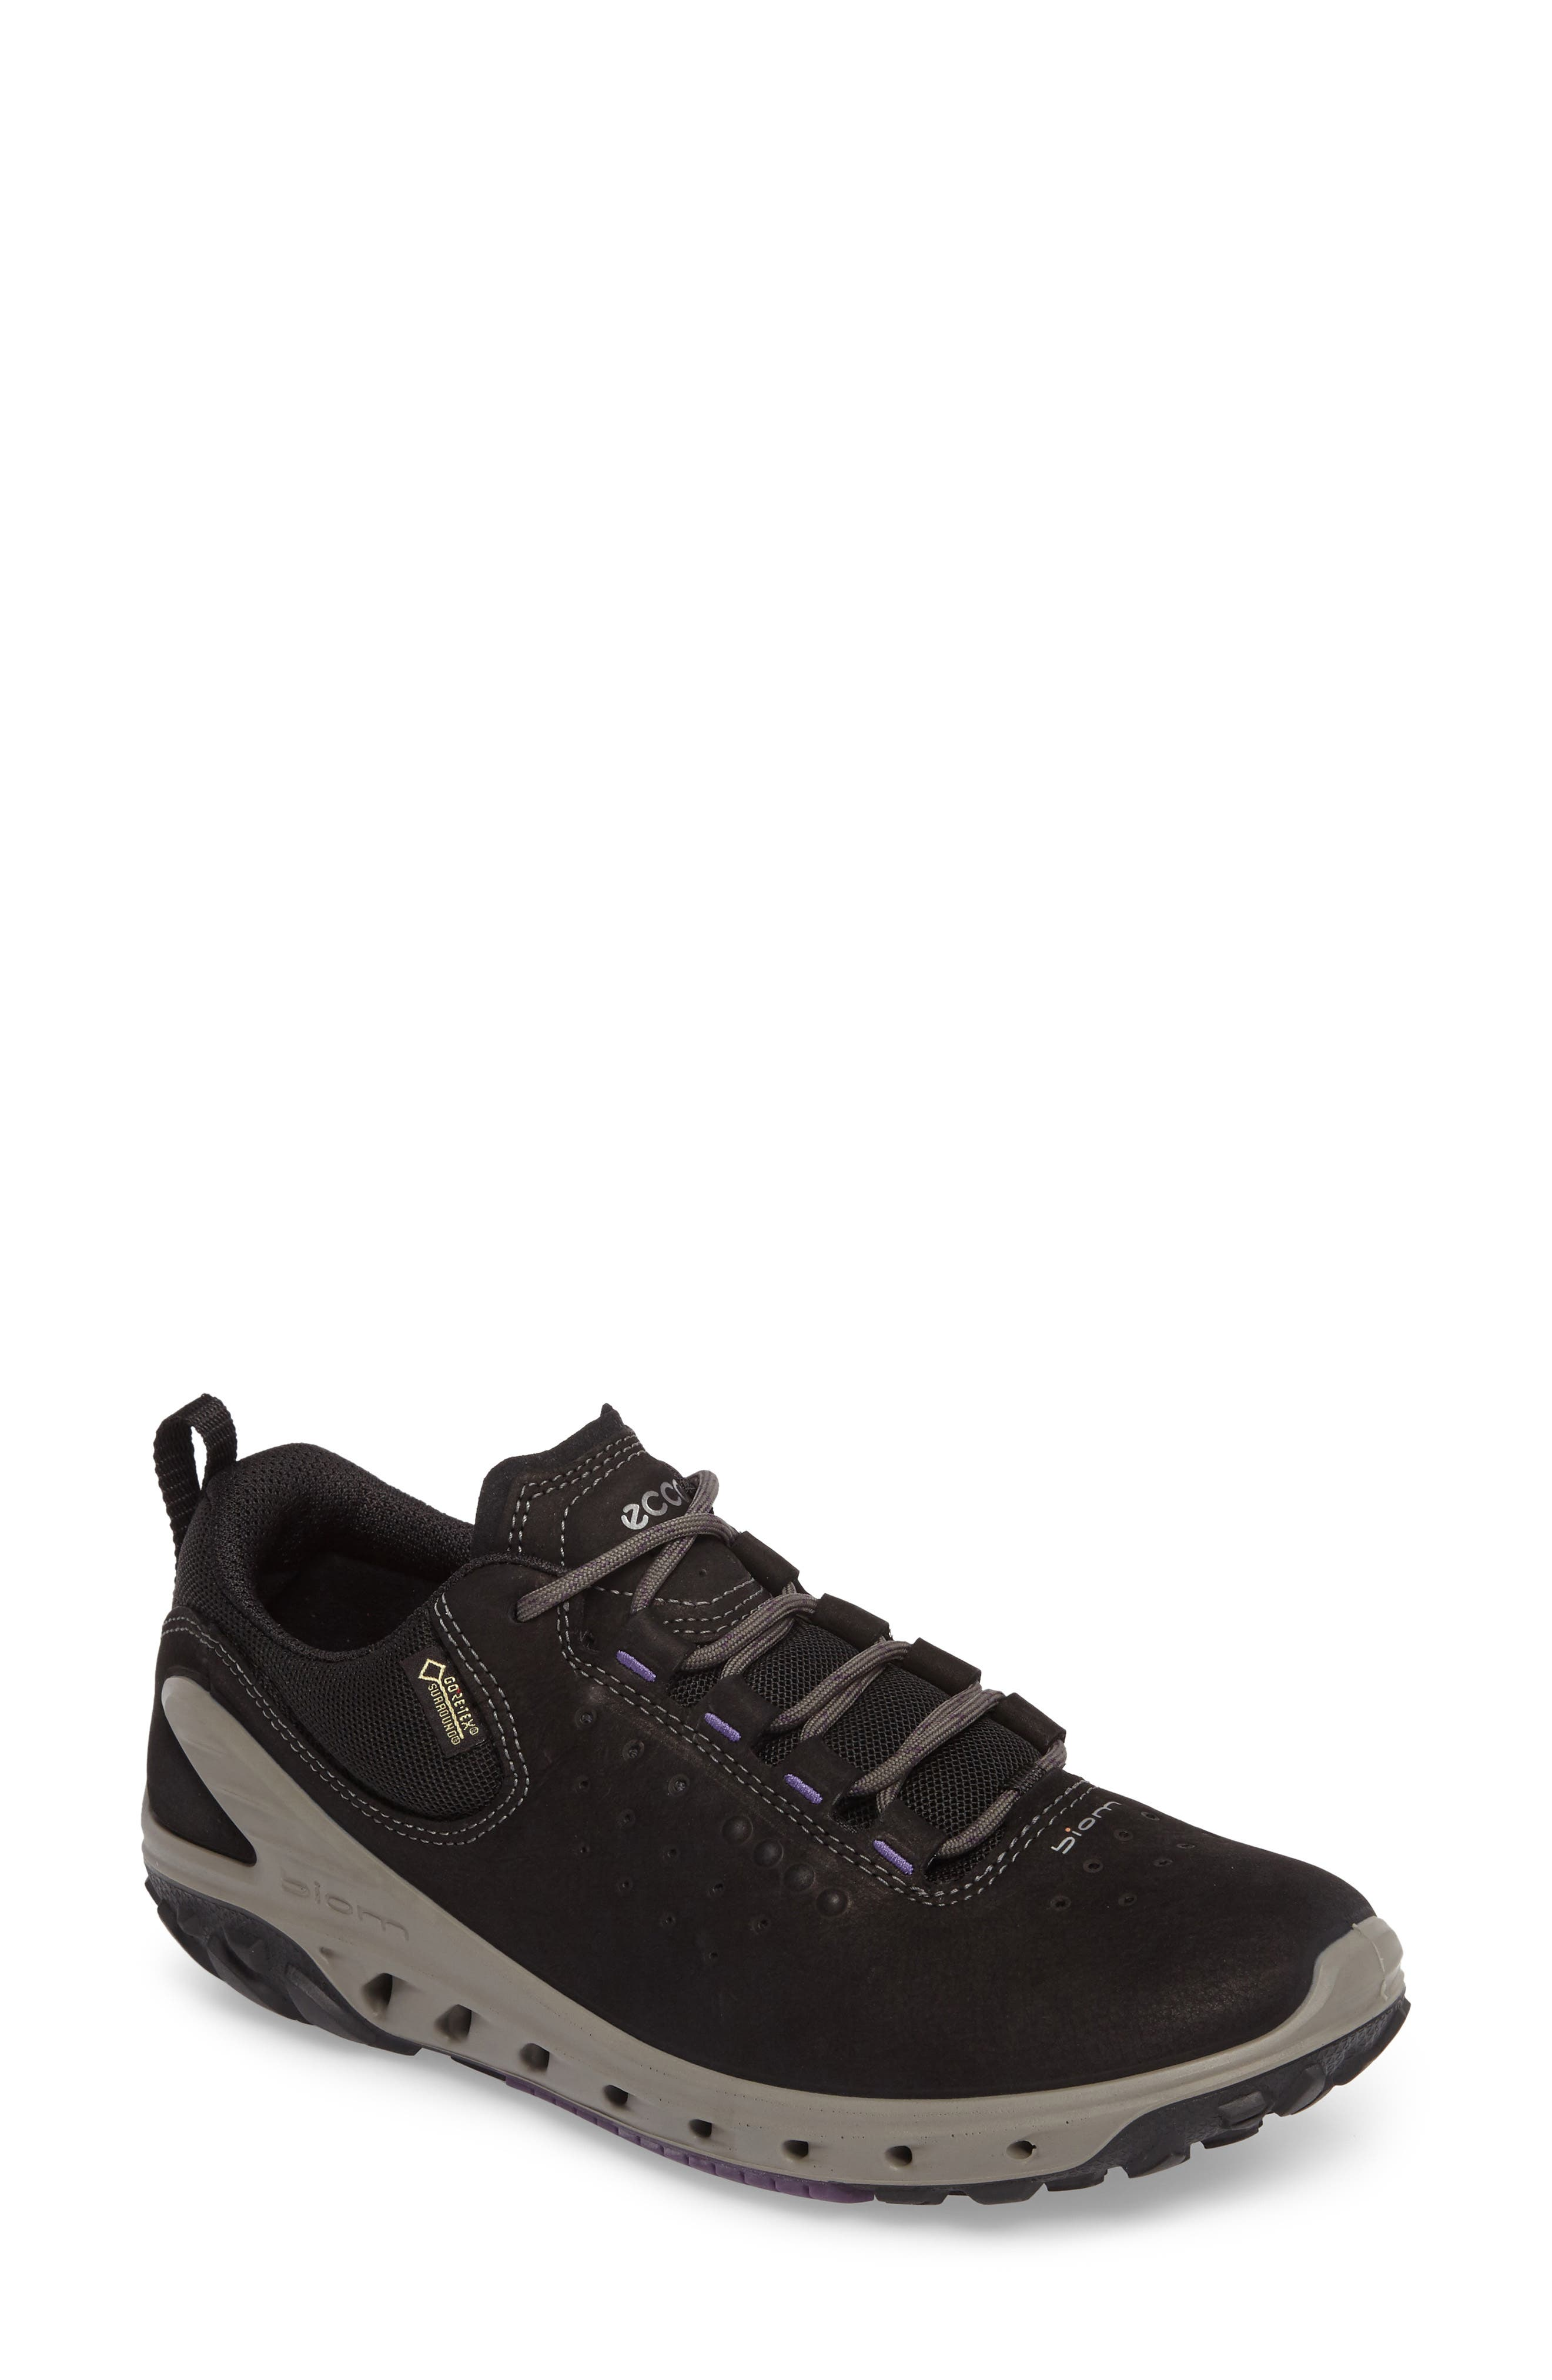 BIOM Venture GTX Sneaker,                         Main,                         color, BLACK LEATHER